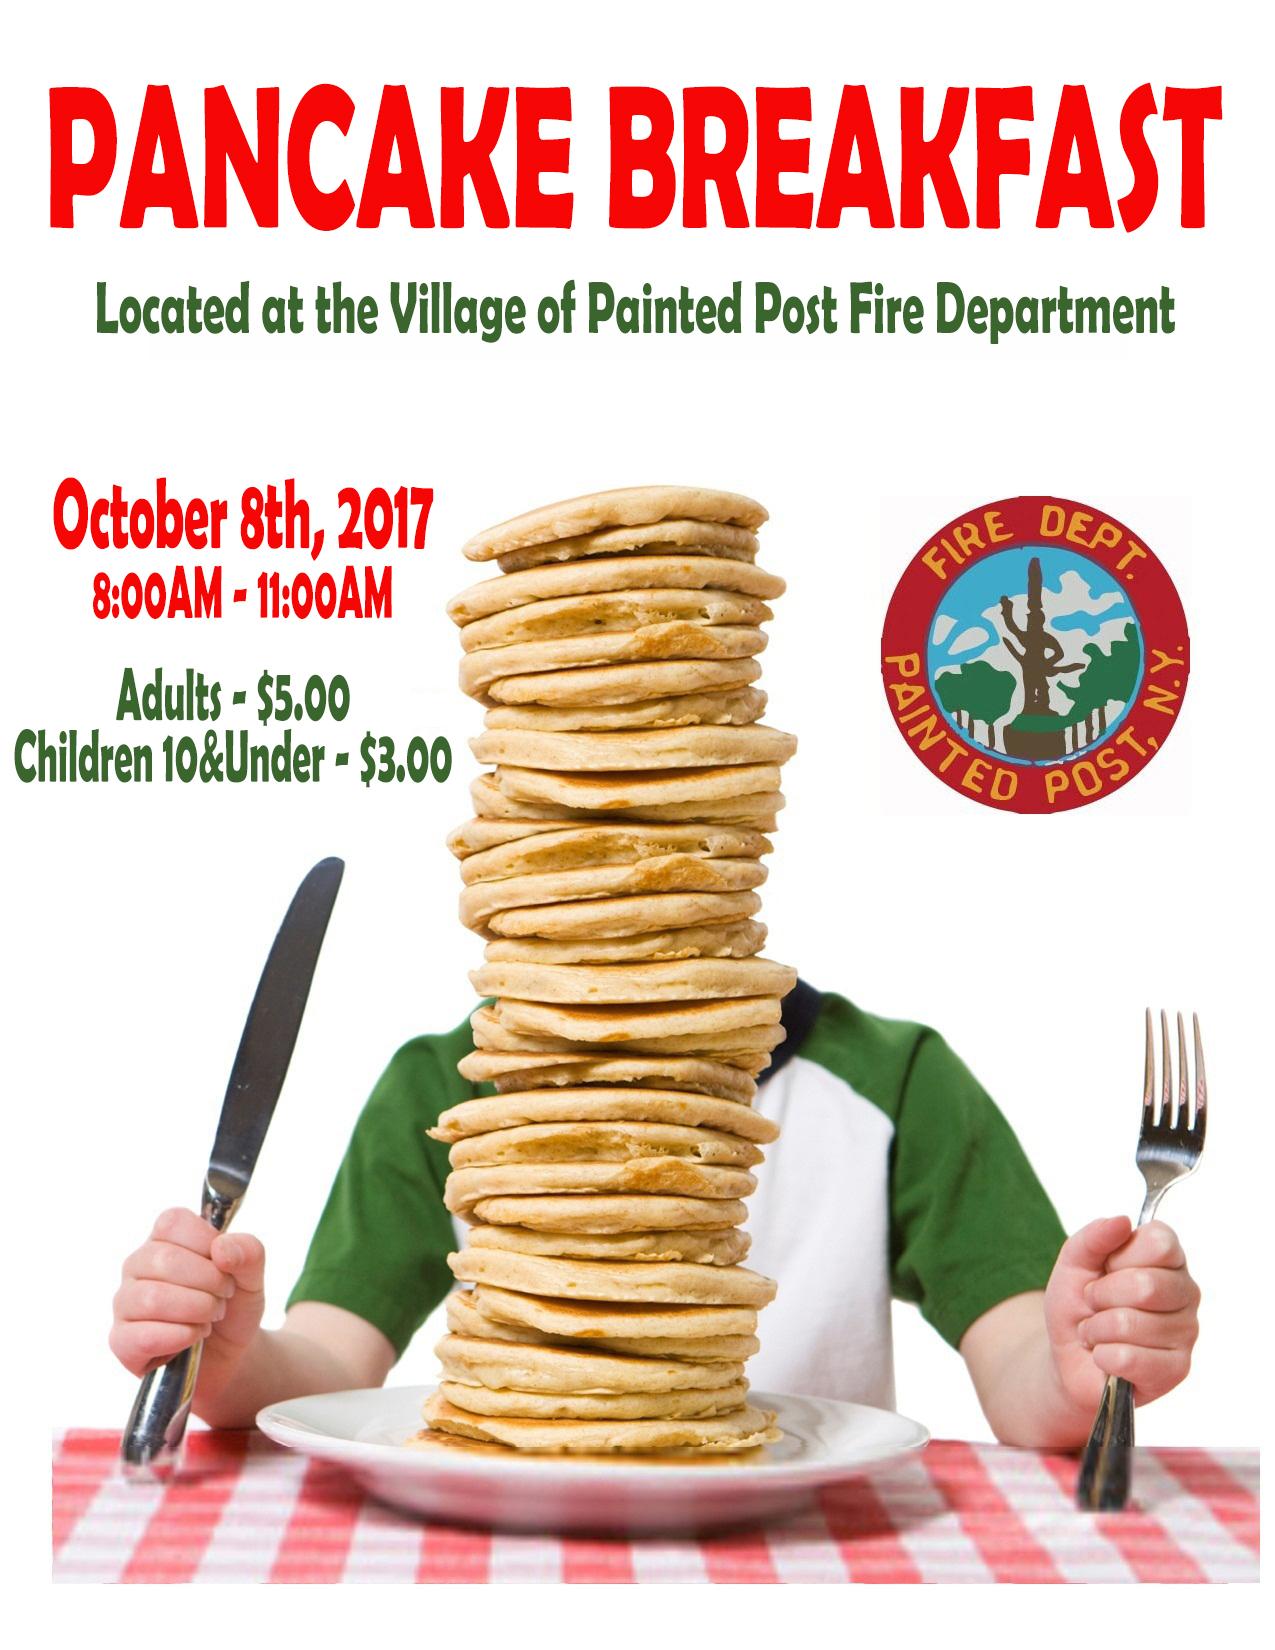 PPFD_Pancake Breakfast_2017_NOMAX